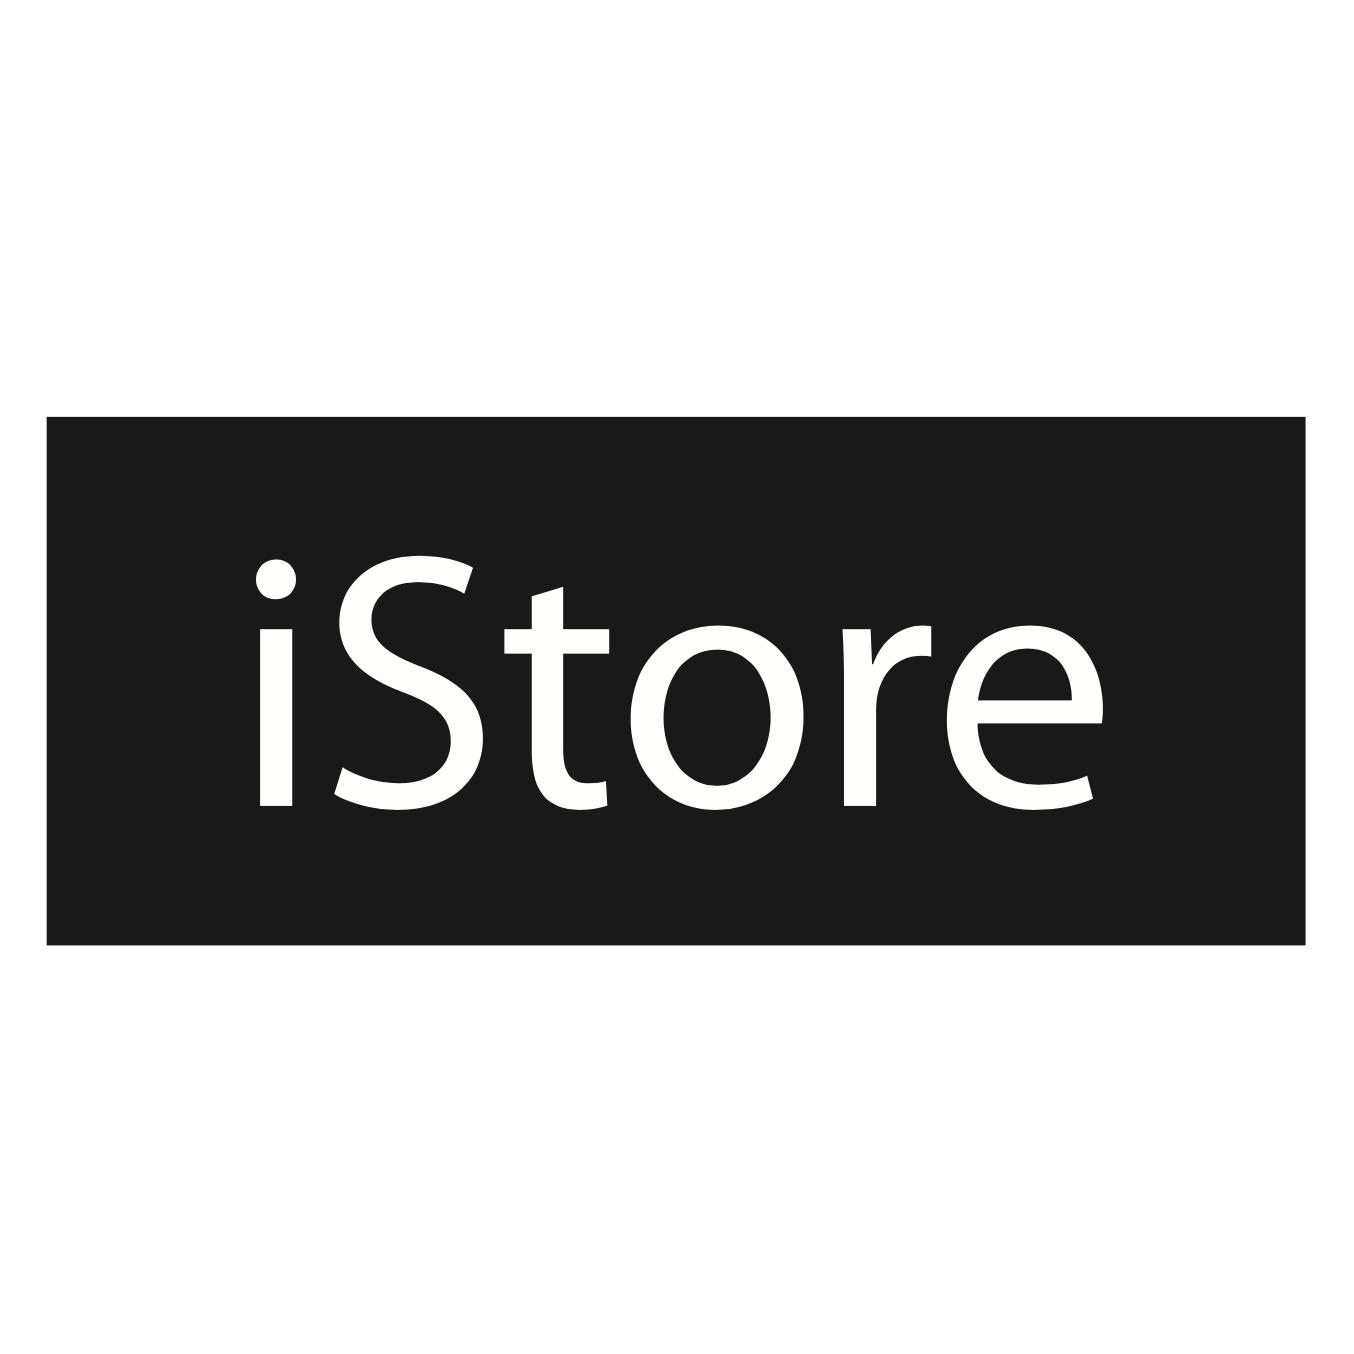 Case Mate Brilliance Lace iPhone 7 Plus - Rose Gold